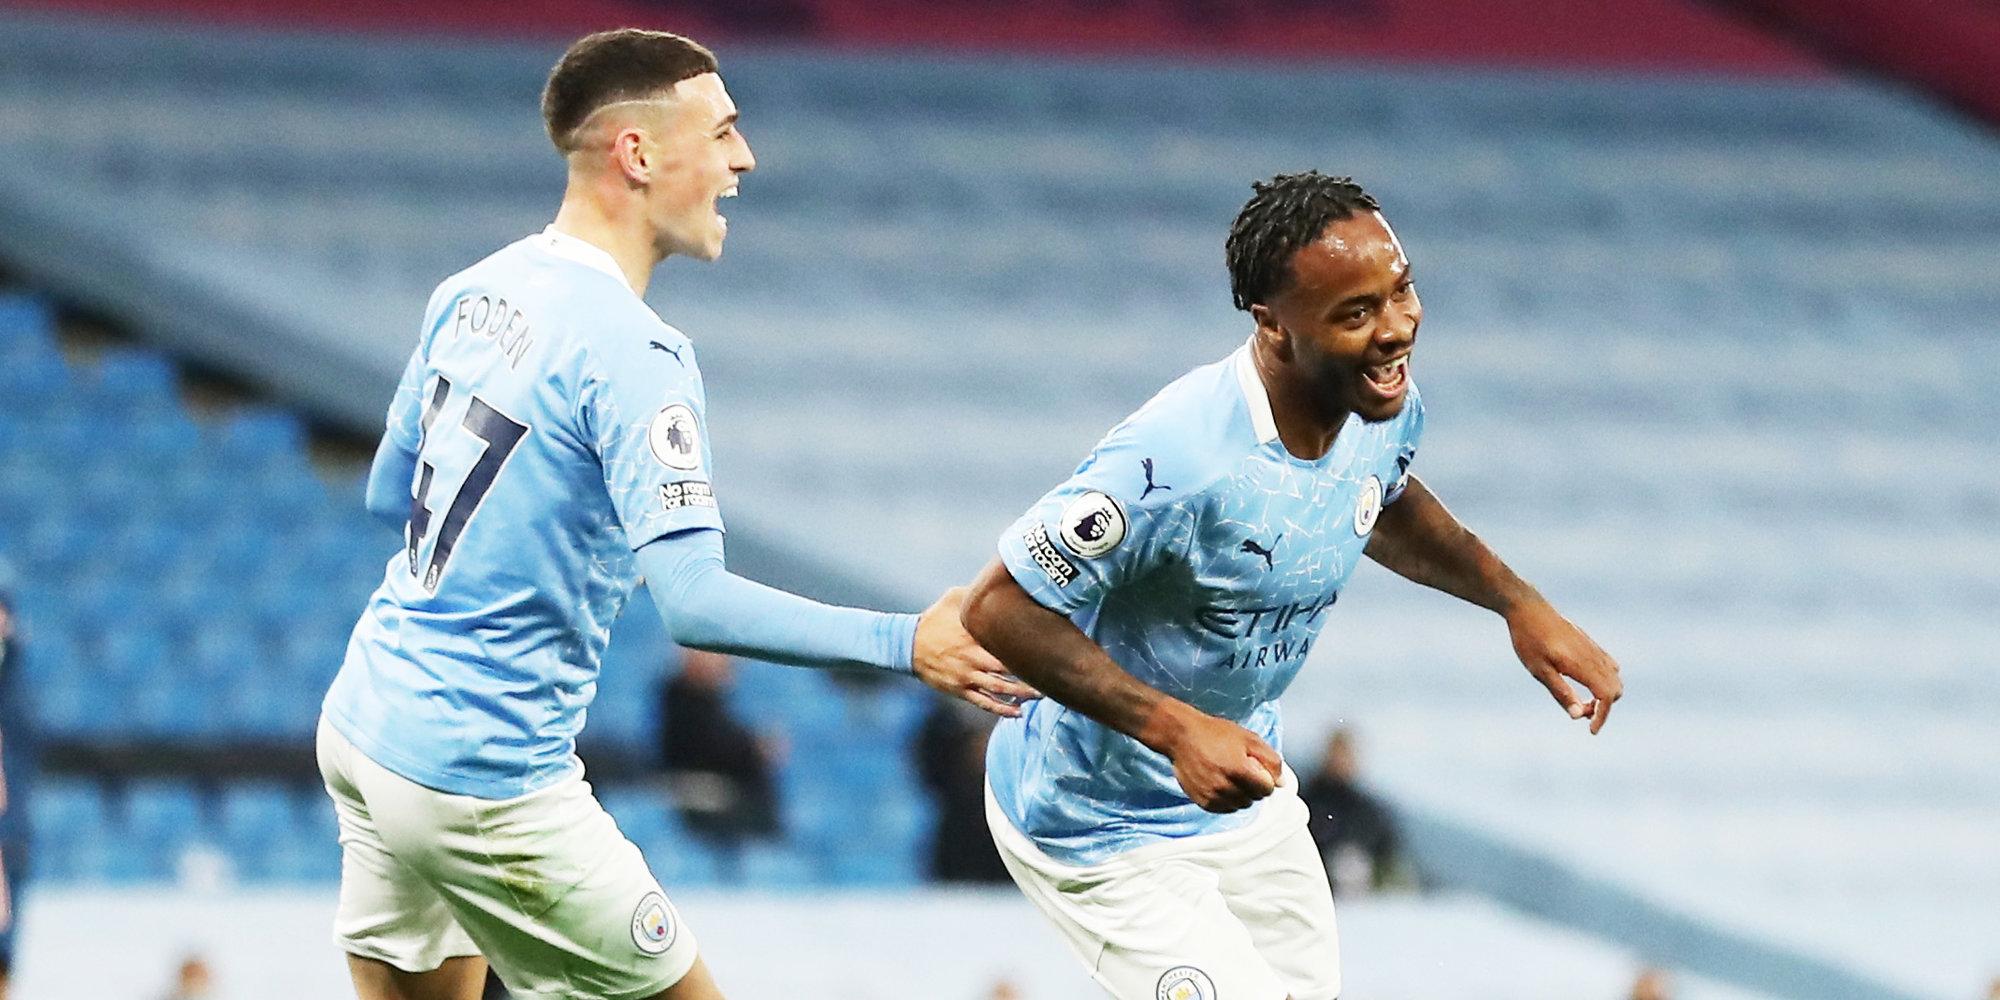 «Манчестер Сити» намерен продлить контракт со Стерлингом и Фоденом